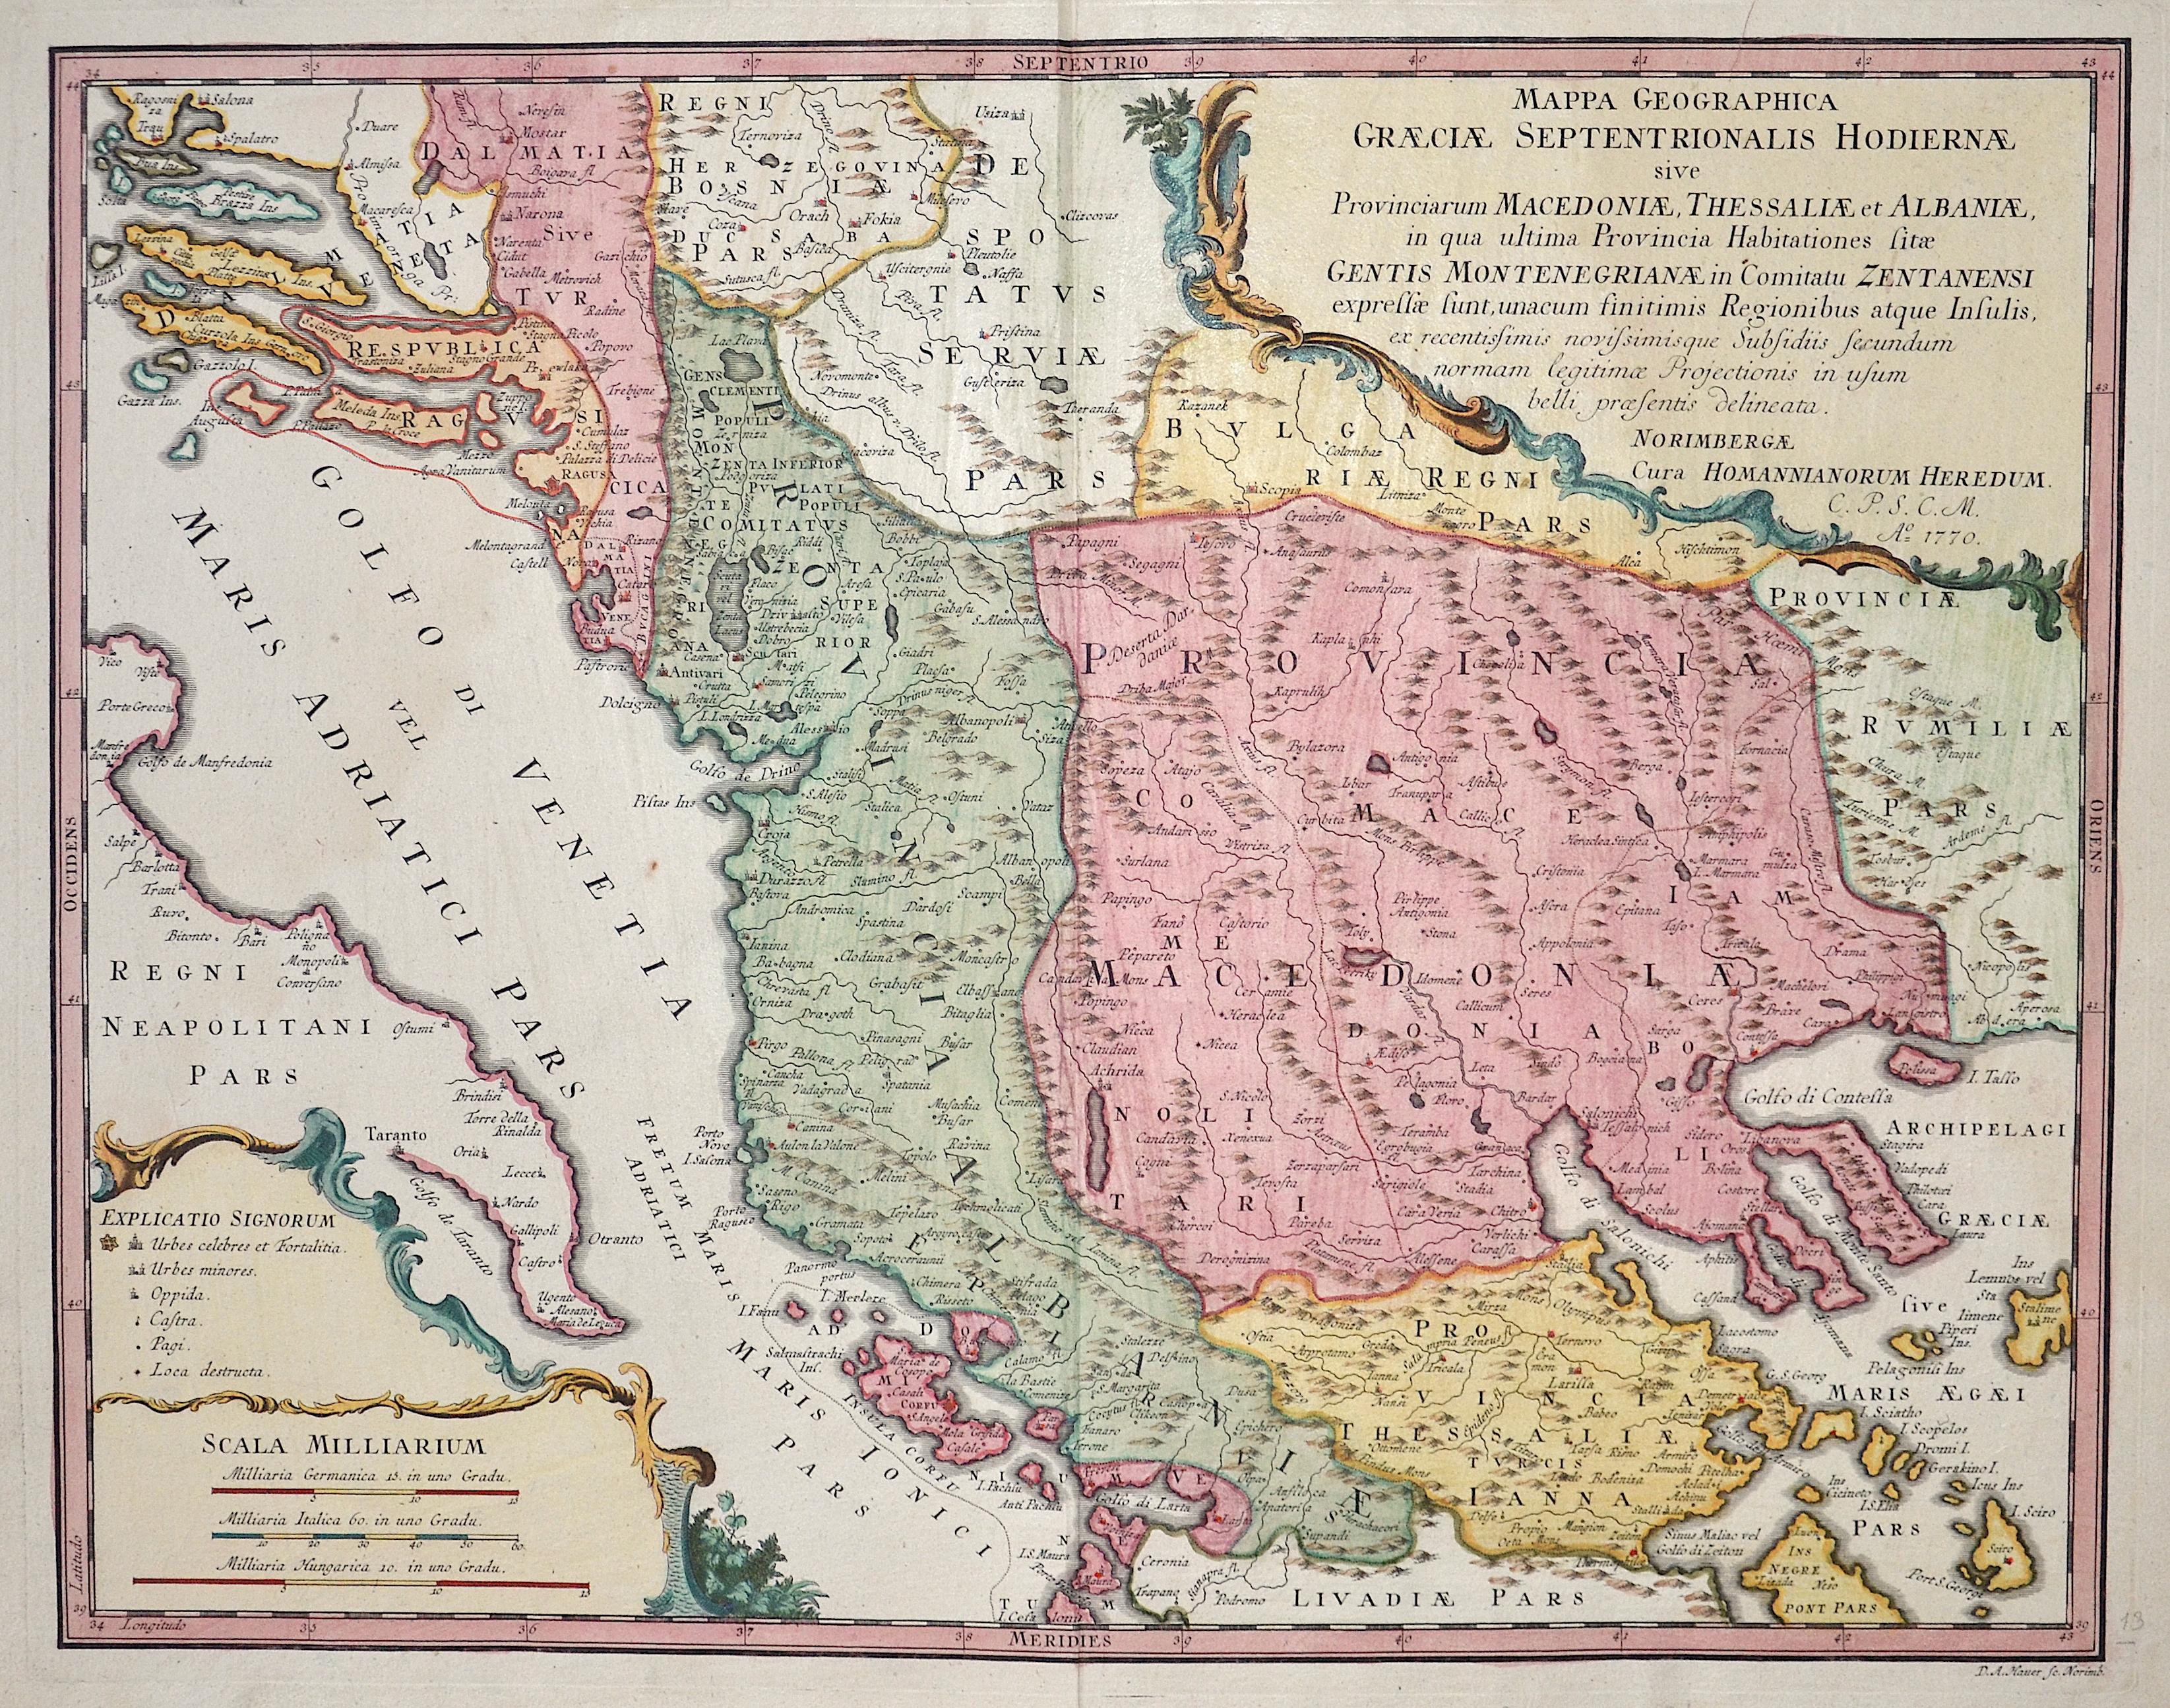 Homann Erben  Mappa Geographica Graeciae Septentrionalis Hodiernae sive Provinciarum Macedoniae, Thessaliae et Albaniae